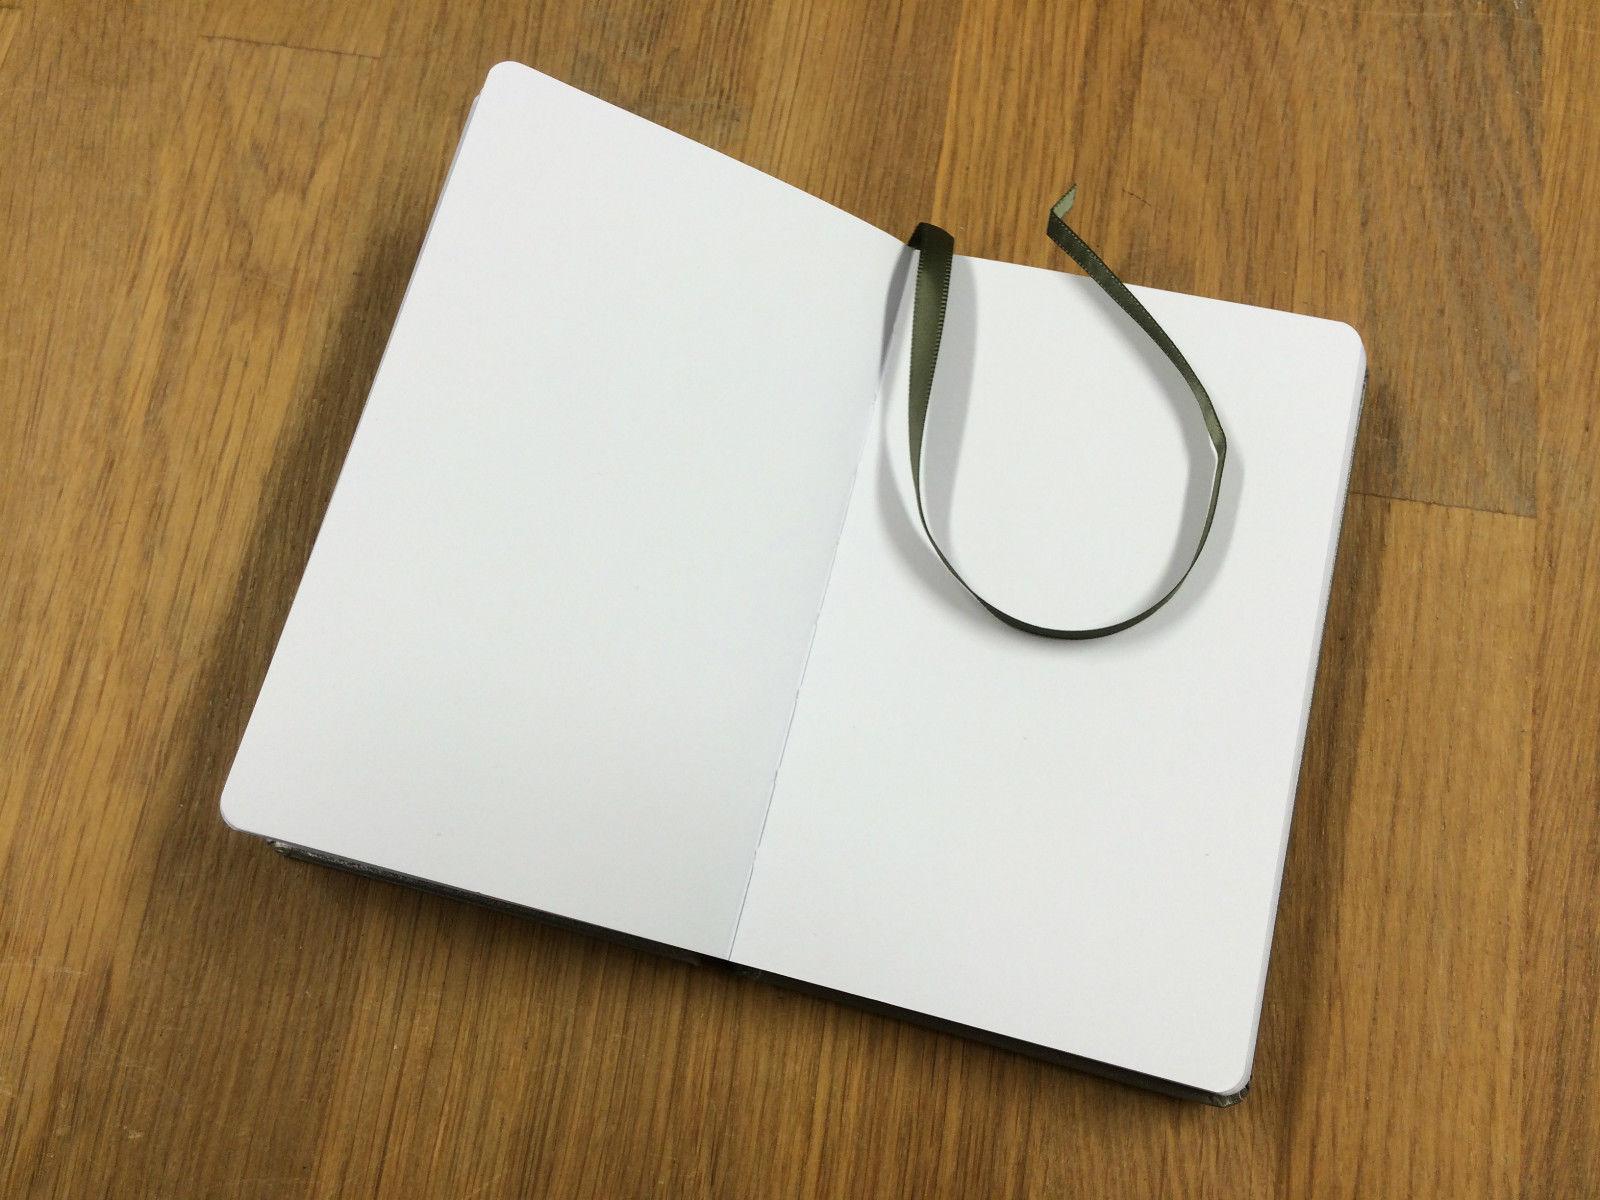 Leuchtturm-A5-Hardback-Sketch-Book-Quality-180gsm-Artists-Drawing-Sketchbook-152114721245-5